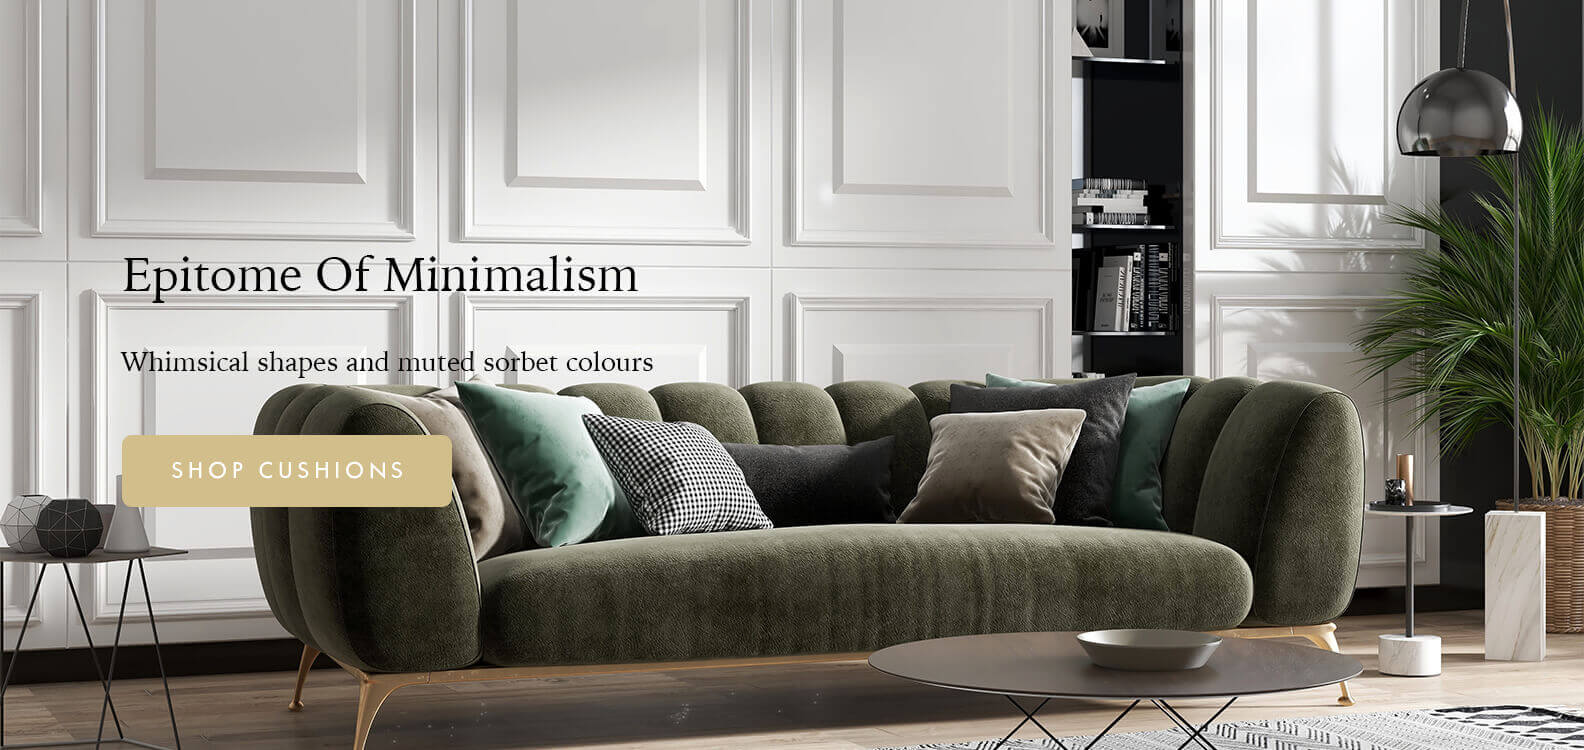 ceramic vases - luxury home decor products